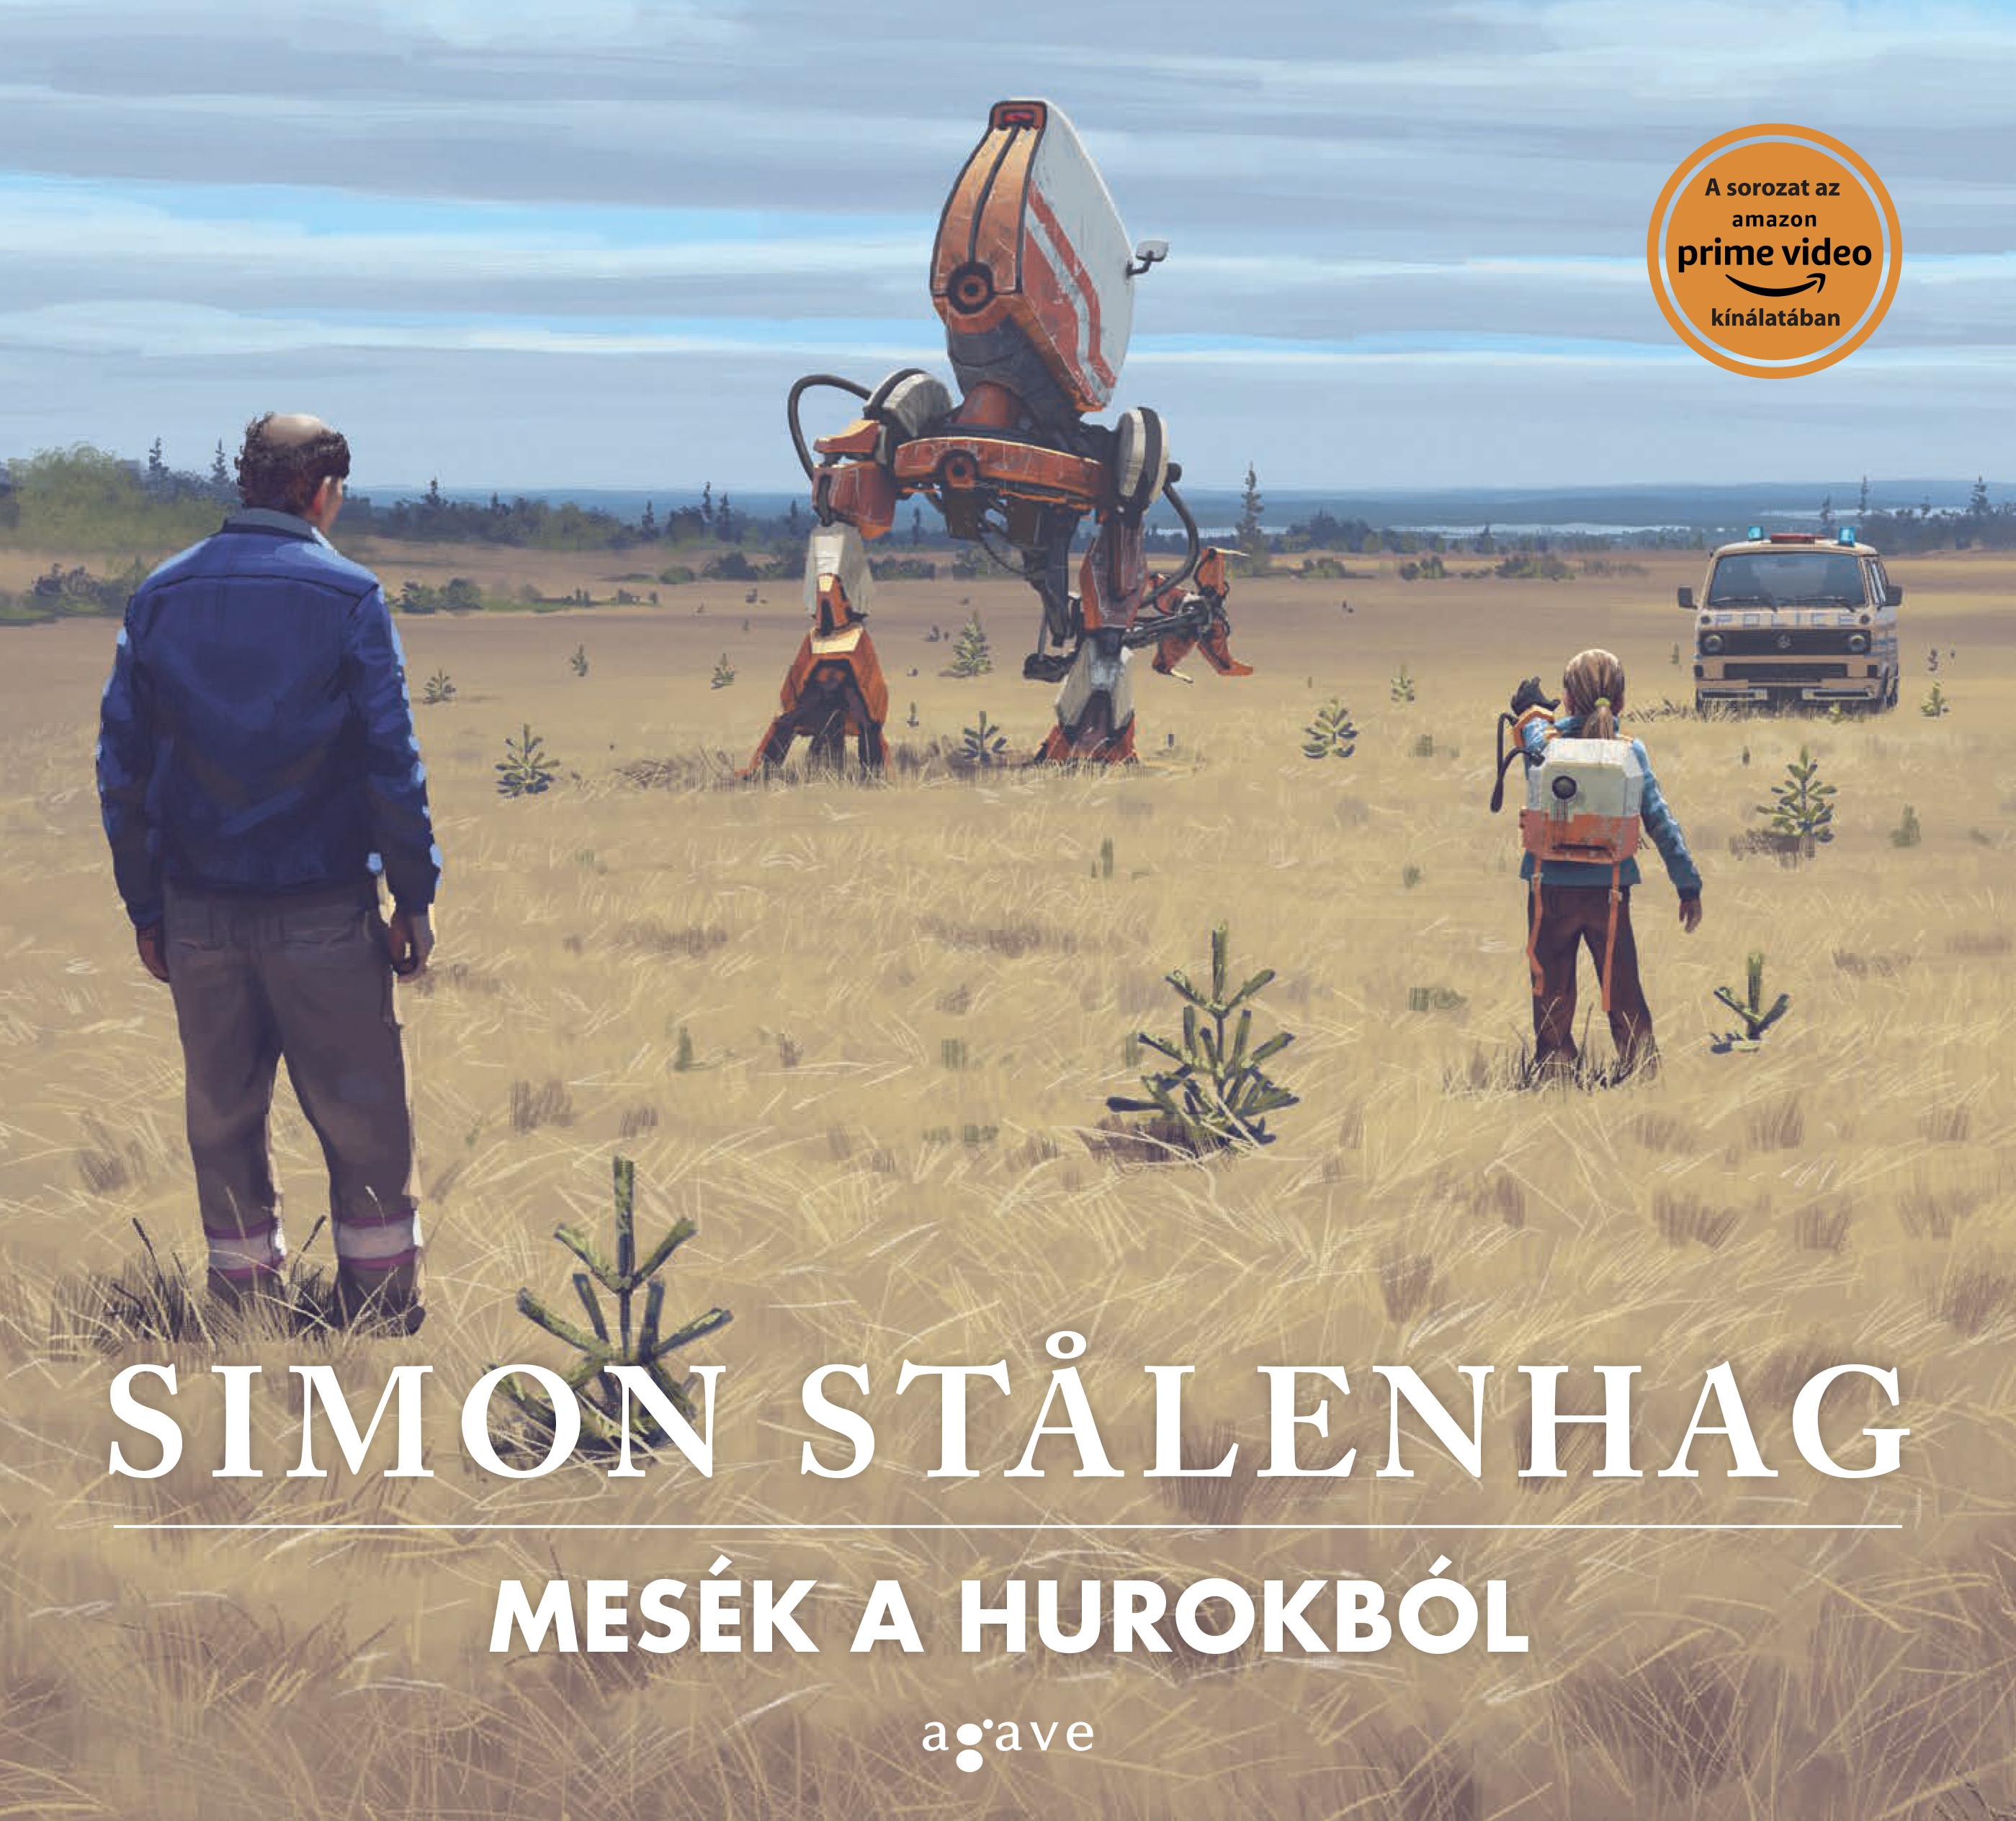 simon_st_lenhag_mesek_a_hurokbol_borito.jpg